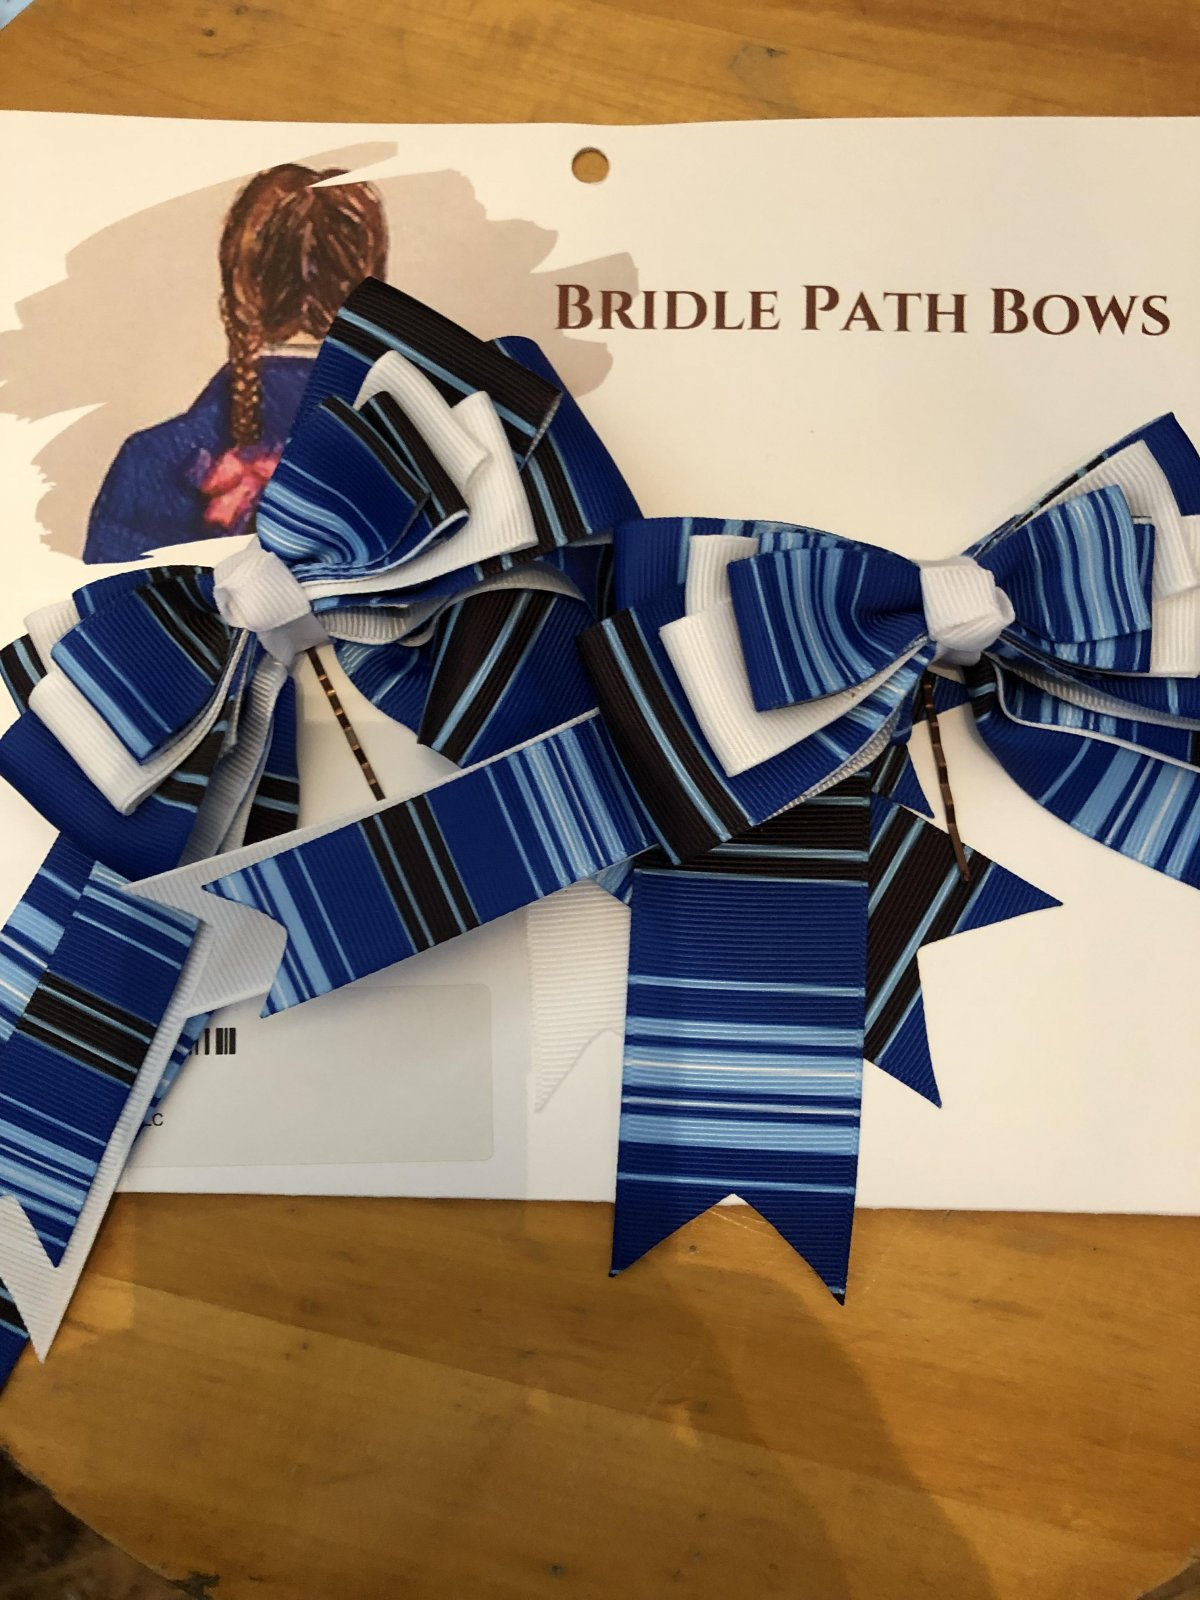 BRIDLE PATH BOWS